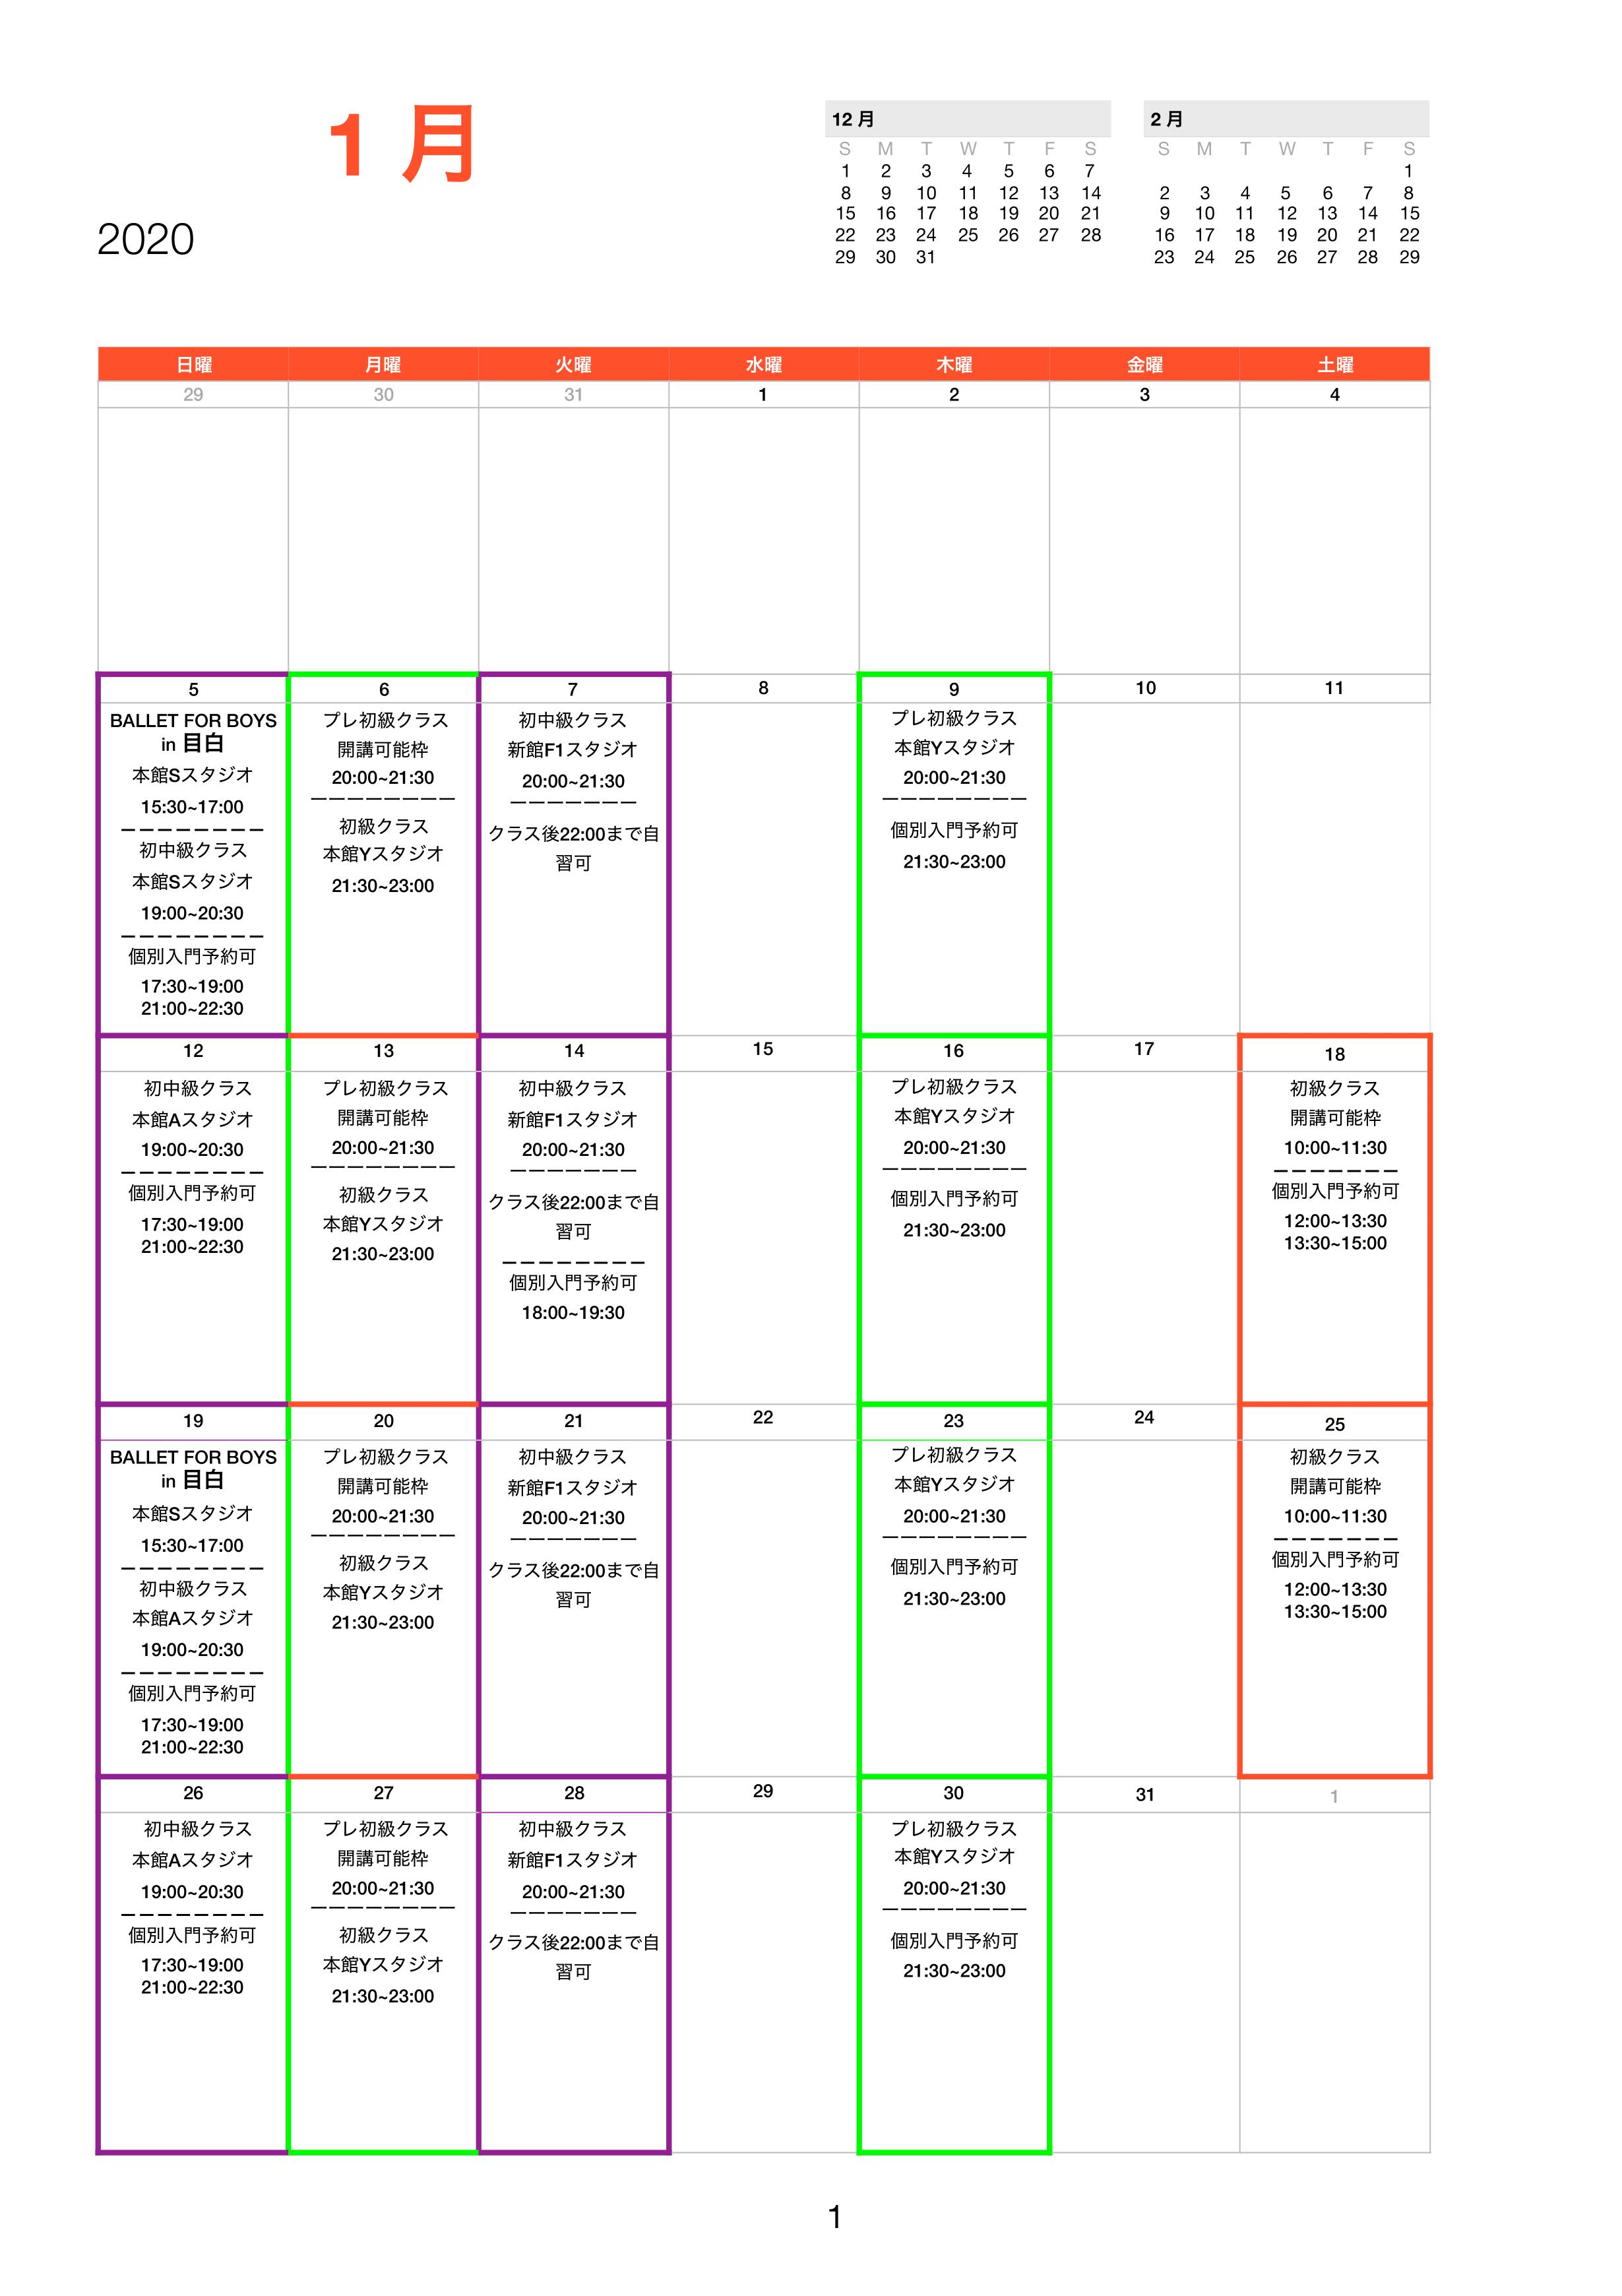 BFMsch2020:1-1